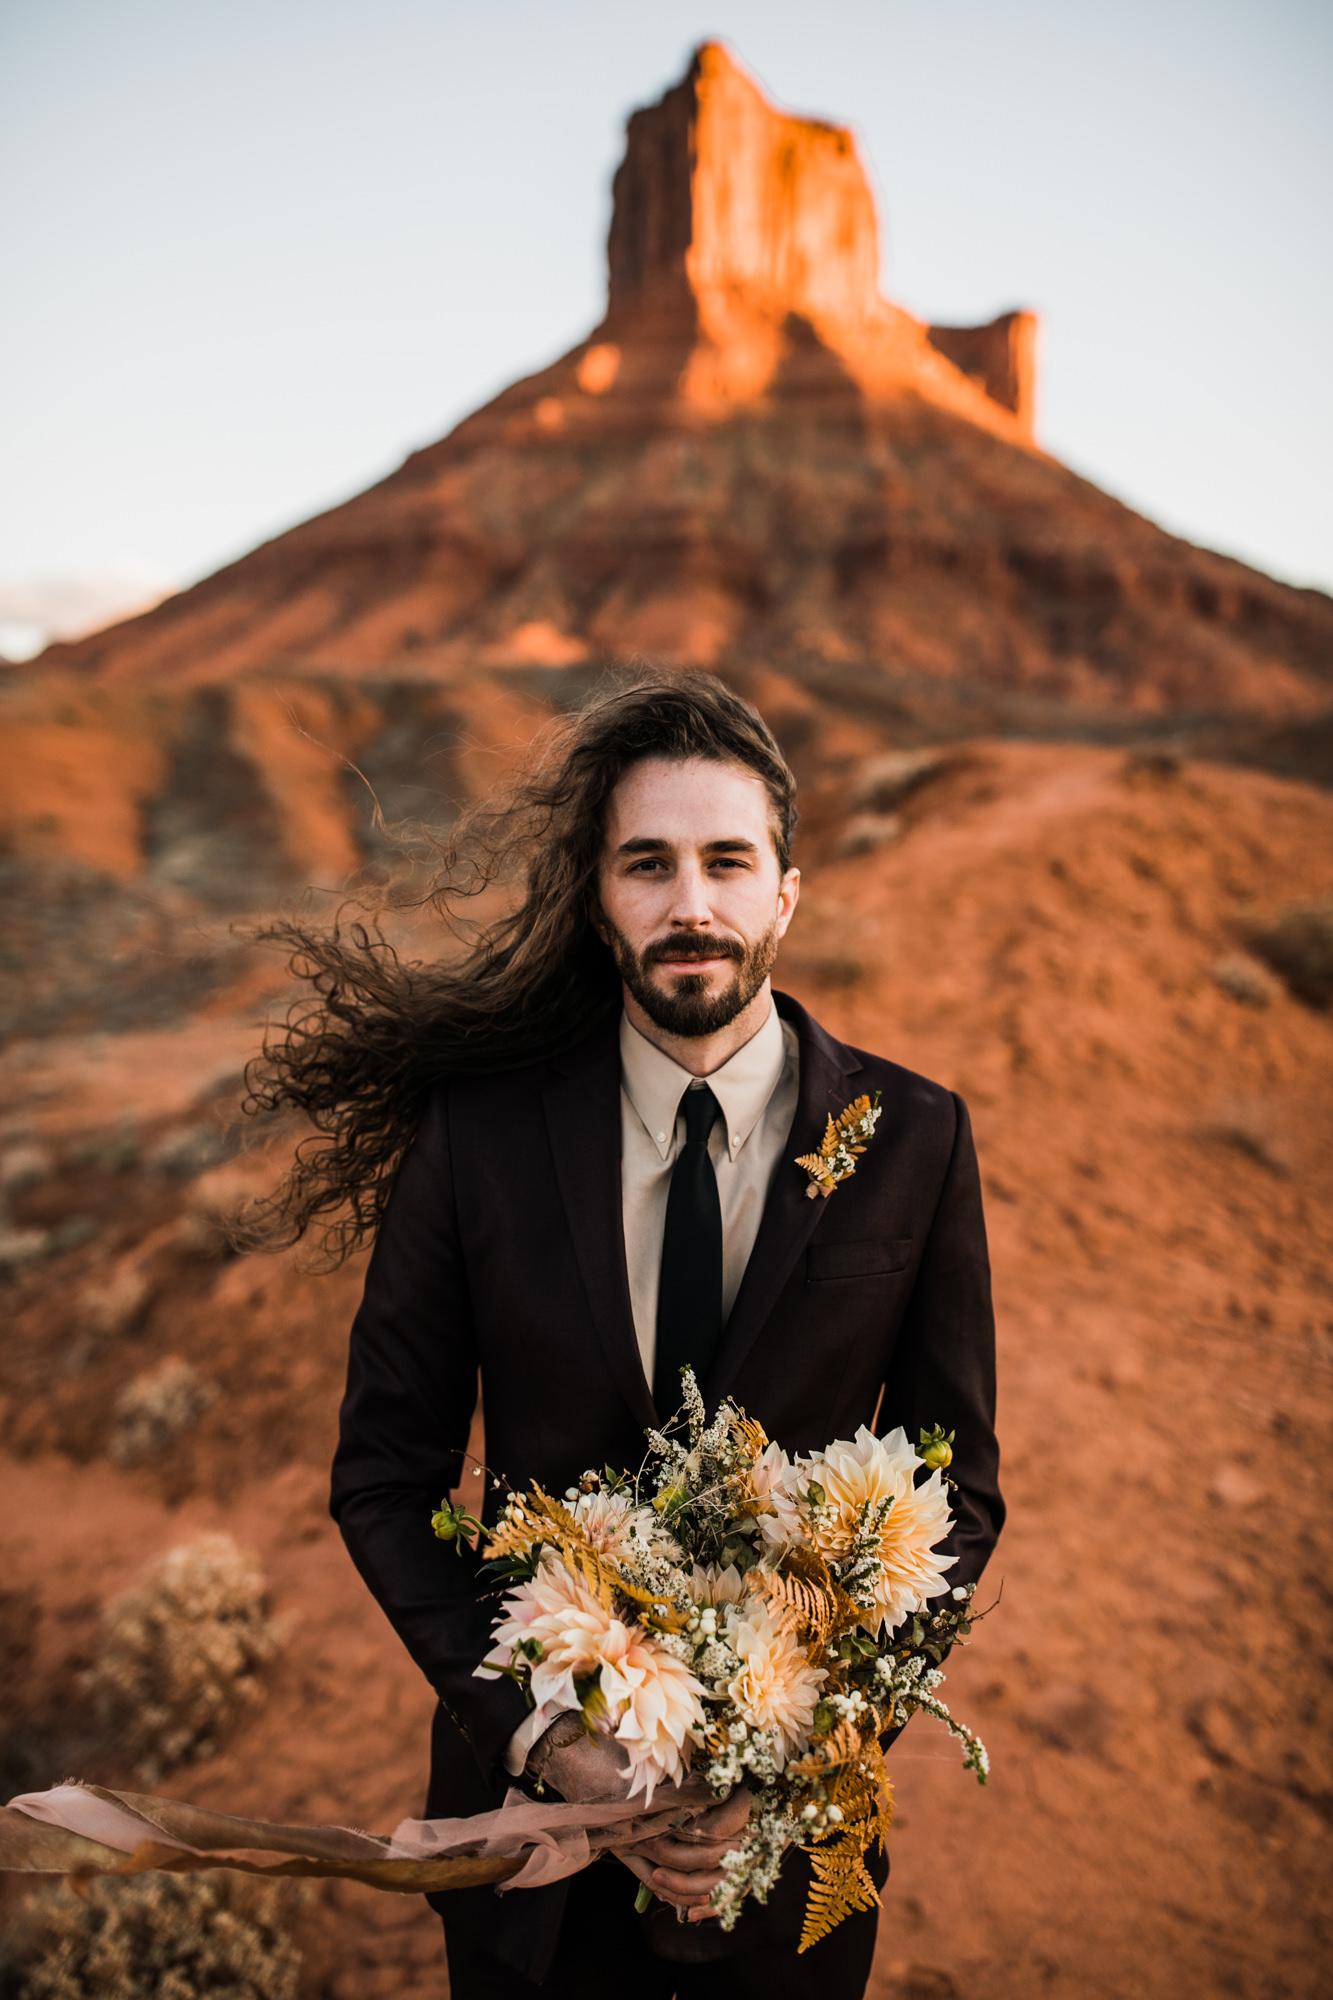 elopement groom style in moab, utah | destination adventure wedding photographers | the hearnes adventure photography | www.thehearnes.com